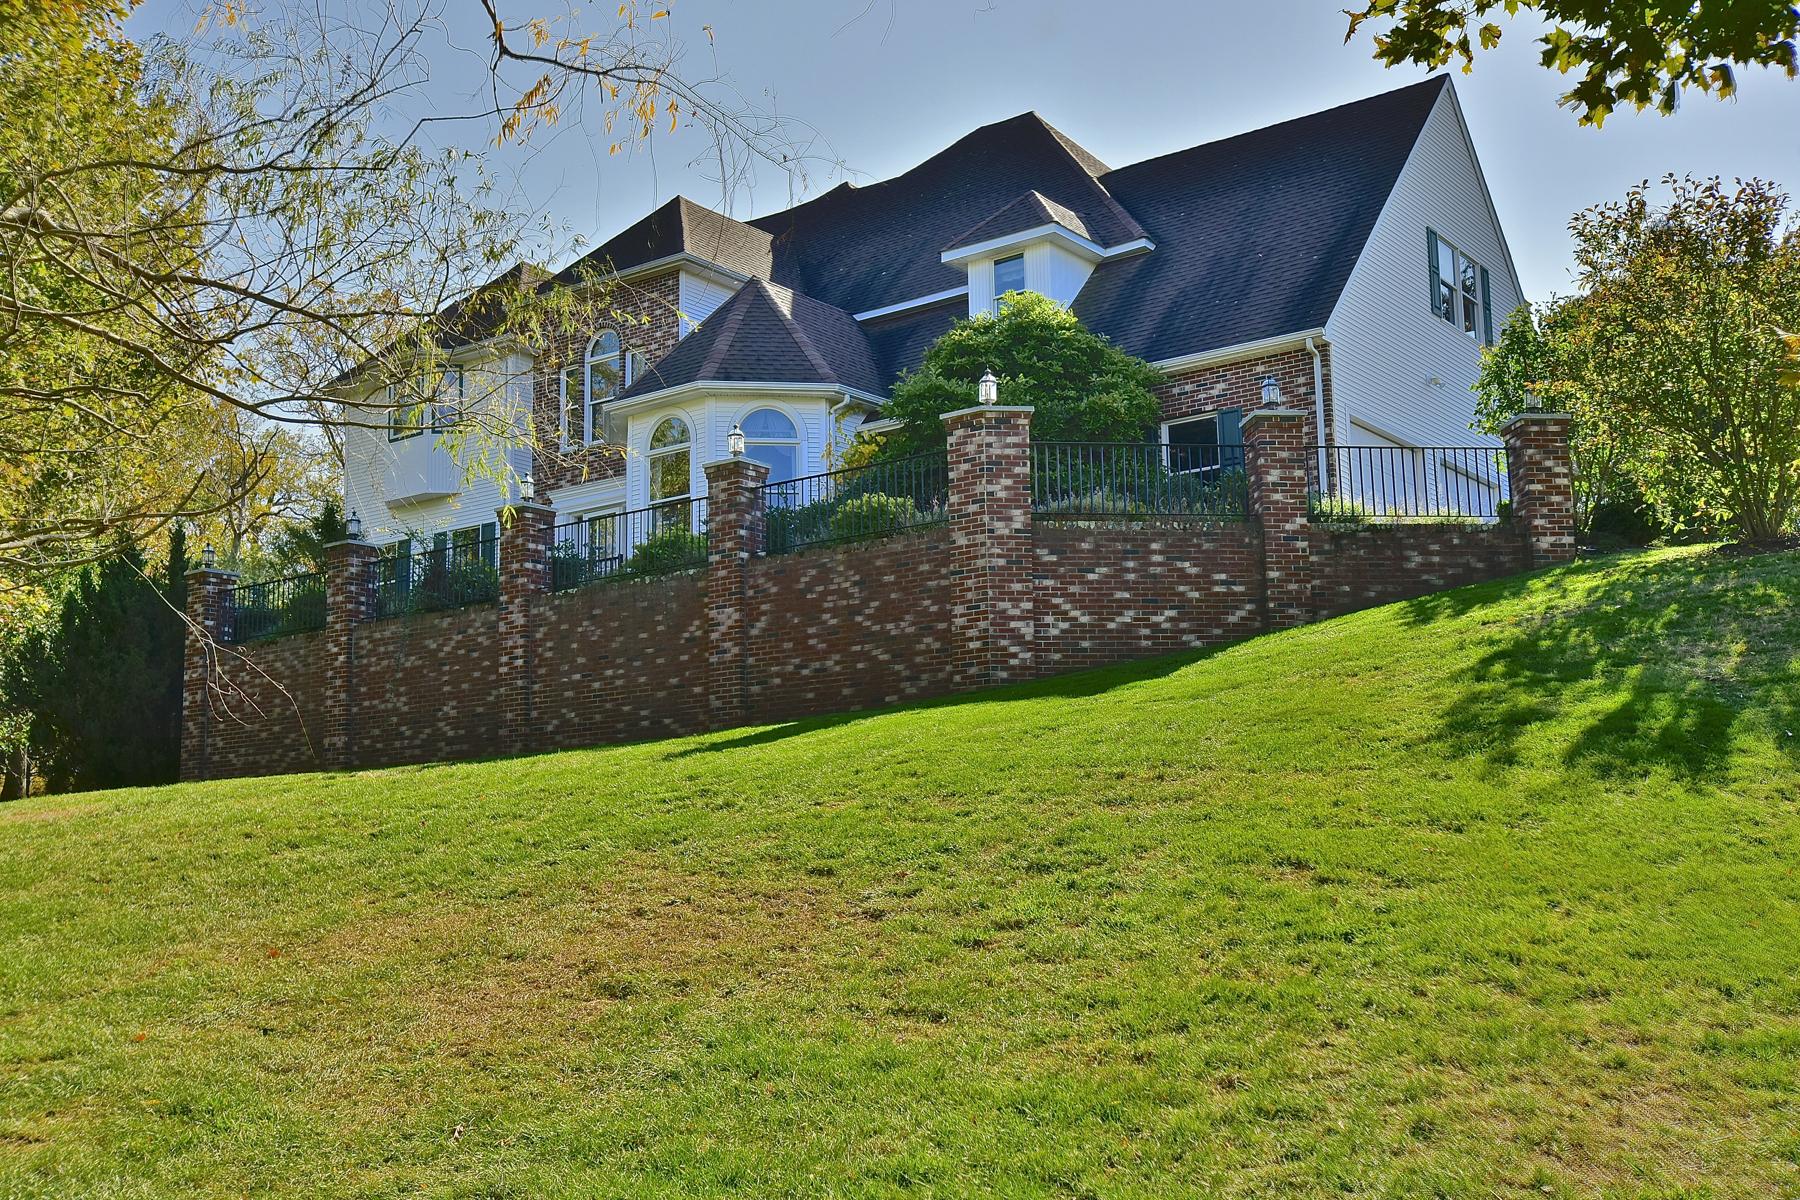 独户住宅 为 销售 在 Luxuriously Appointed Colonial on Almost 2 Acres 80 Emerald Glen Rd 塞勒姆, 康涅狄格州, 06420 美国